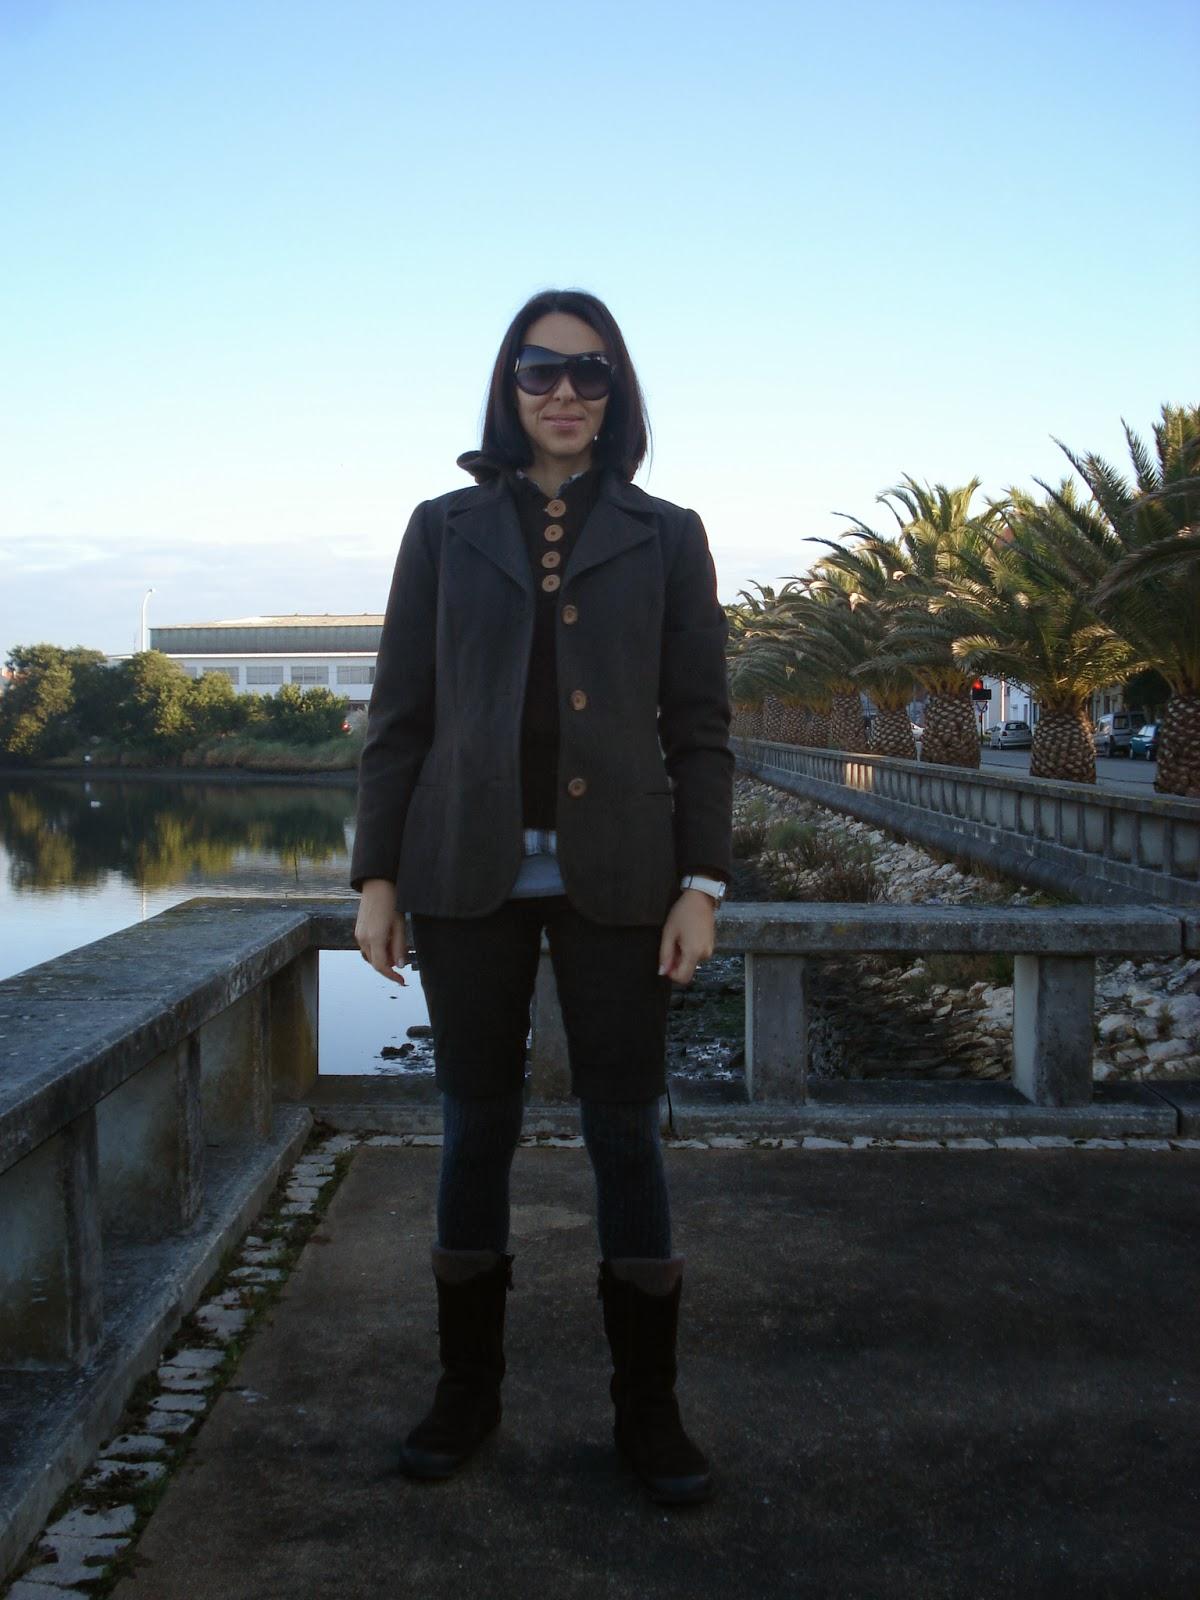 moda, sapatinho, blog, blogue, blogger, fashion, look, visual, Aveiro,